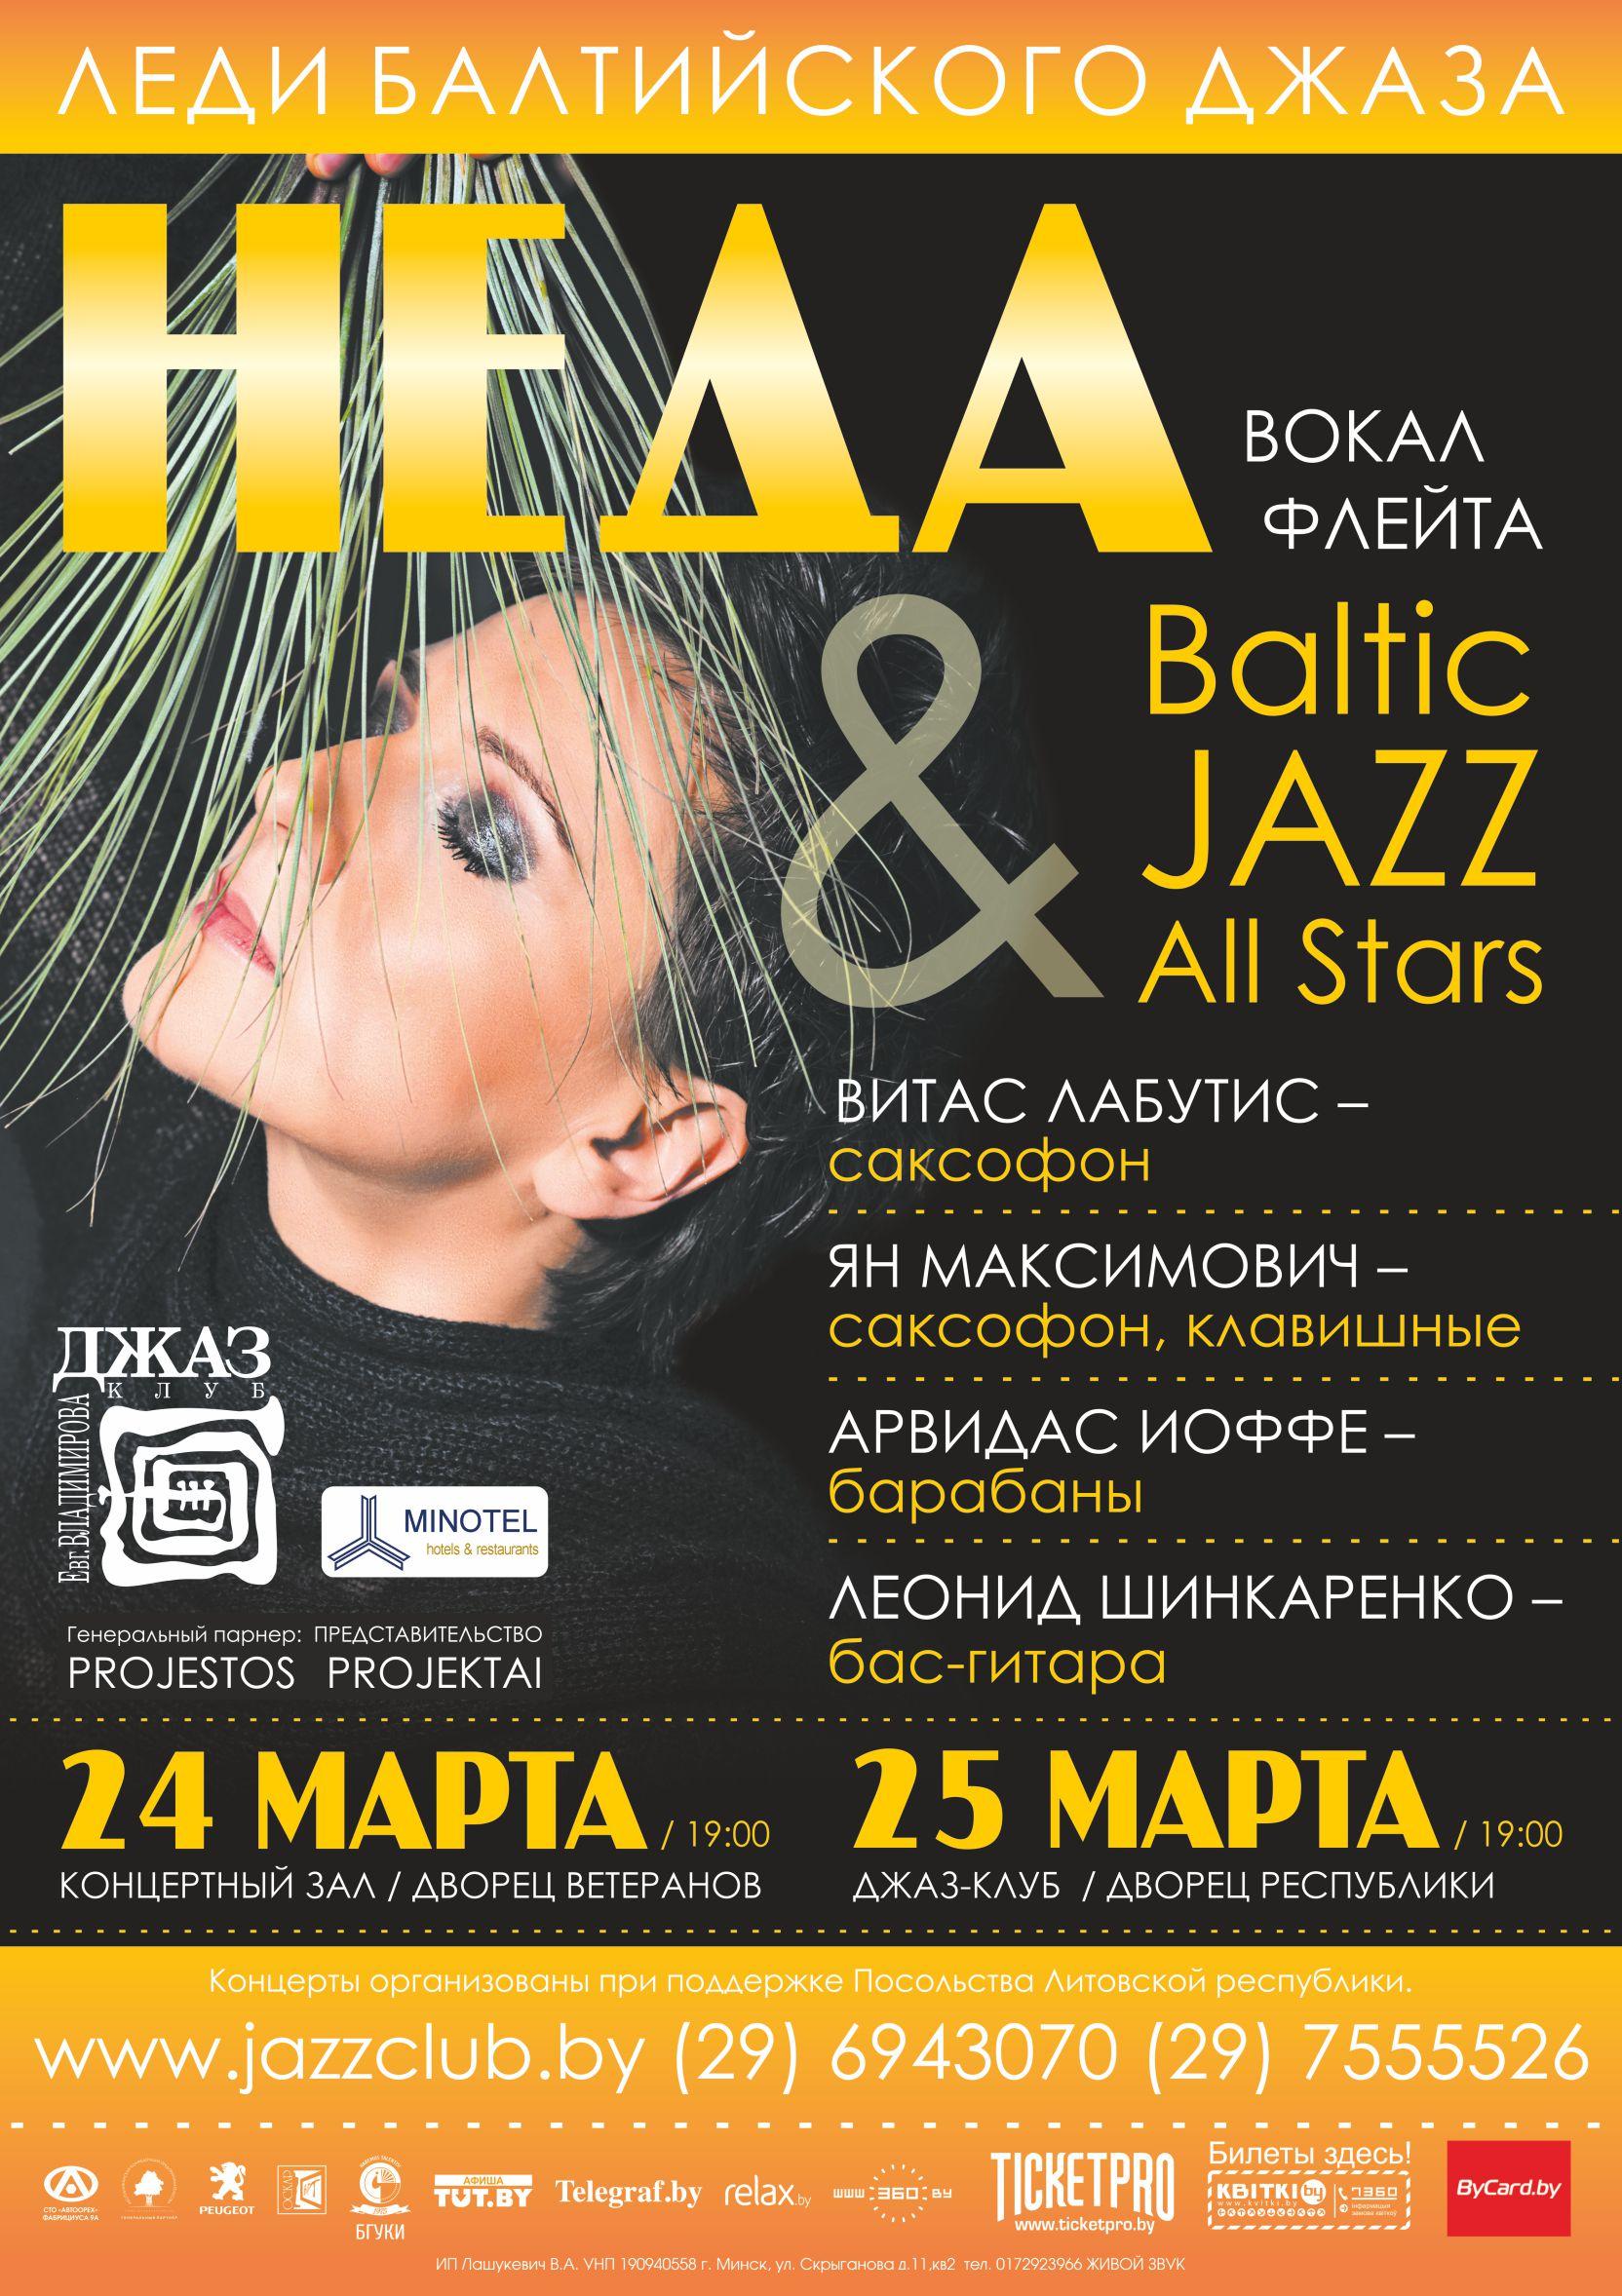 НЕДА (Леди балтийского джаза, вокал, флейта) & Baltic Jazz All Stars. 24-25.03.2016, Минск (сайт Минской школы киноискусства)